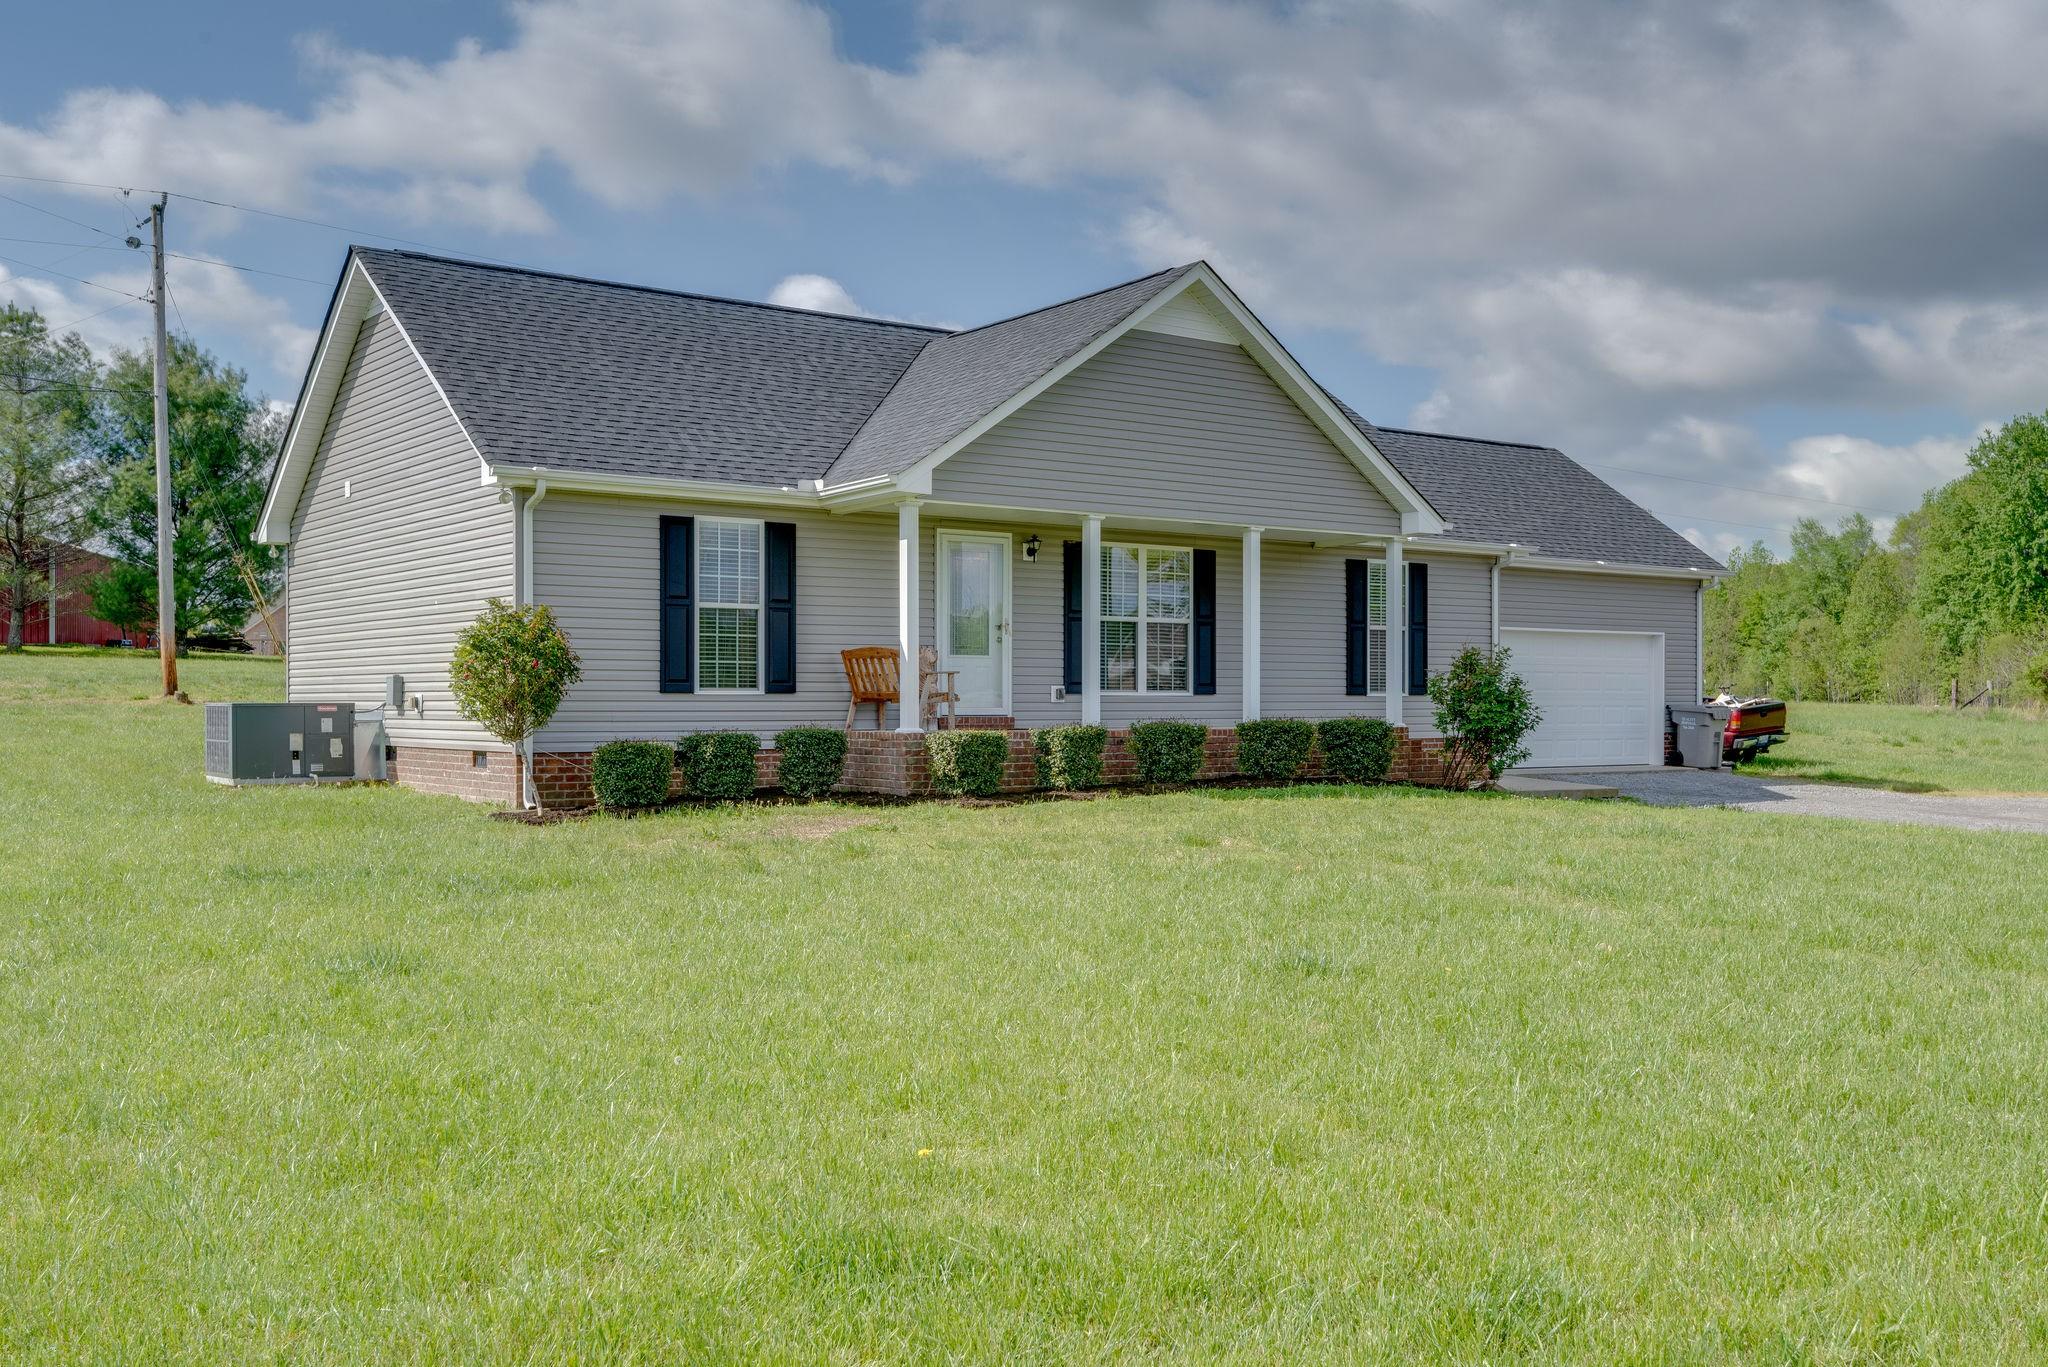 1807 Mosley Ferry Rd, Chapmansboro, TN 37035 - Chapmansboro, TN real estate listing